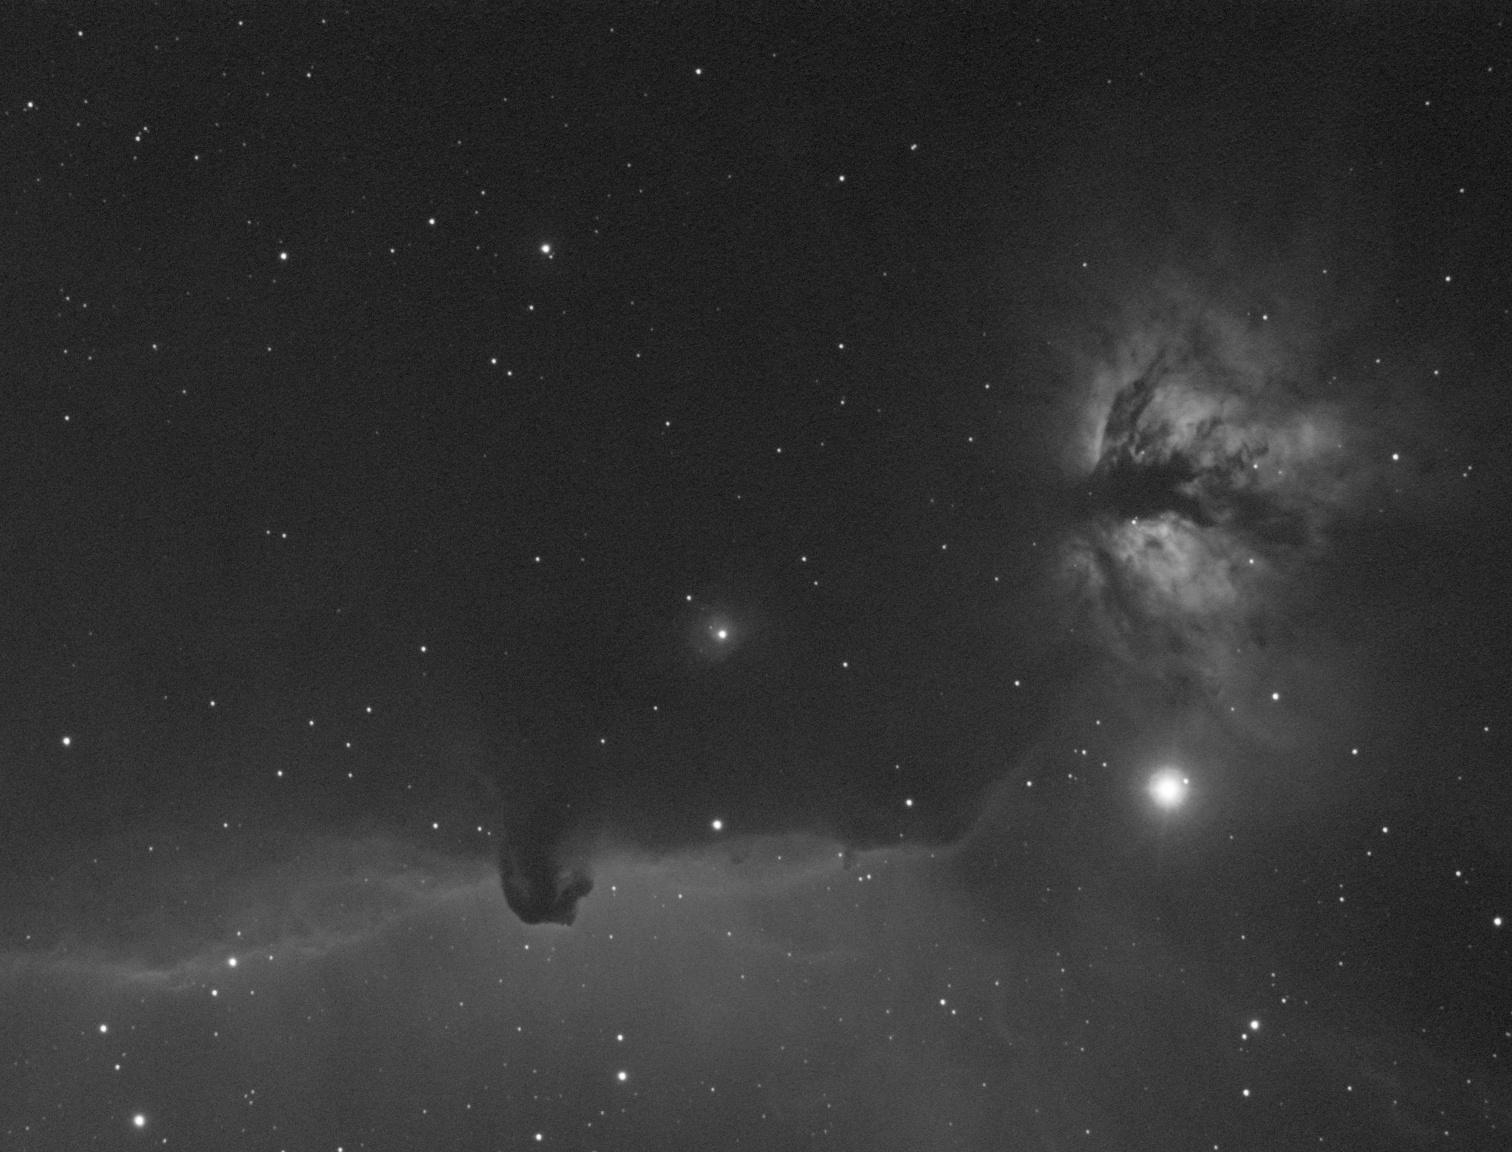 NGC2023-H-alpha.jpg.4941c11b1a5d368296ccc15e0a86b354.jpg